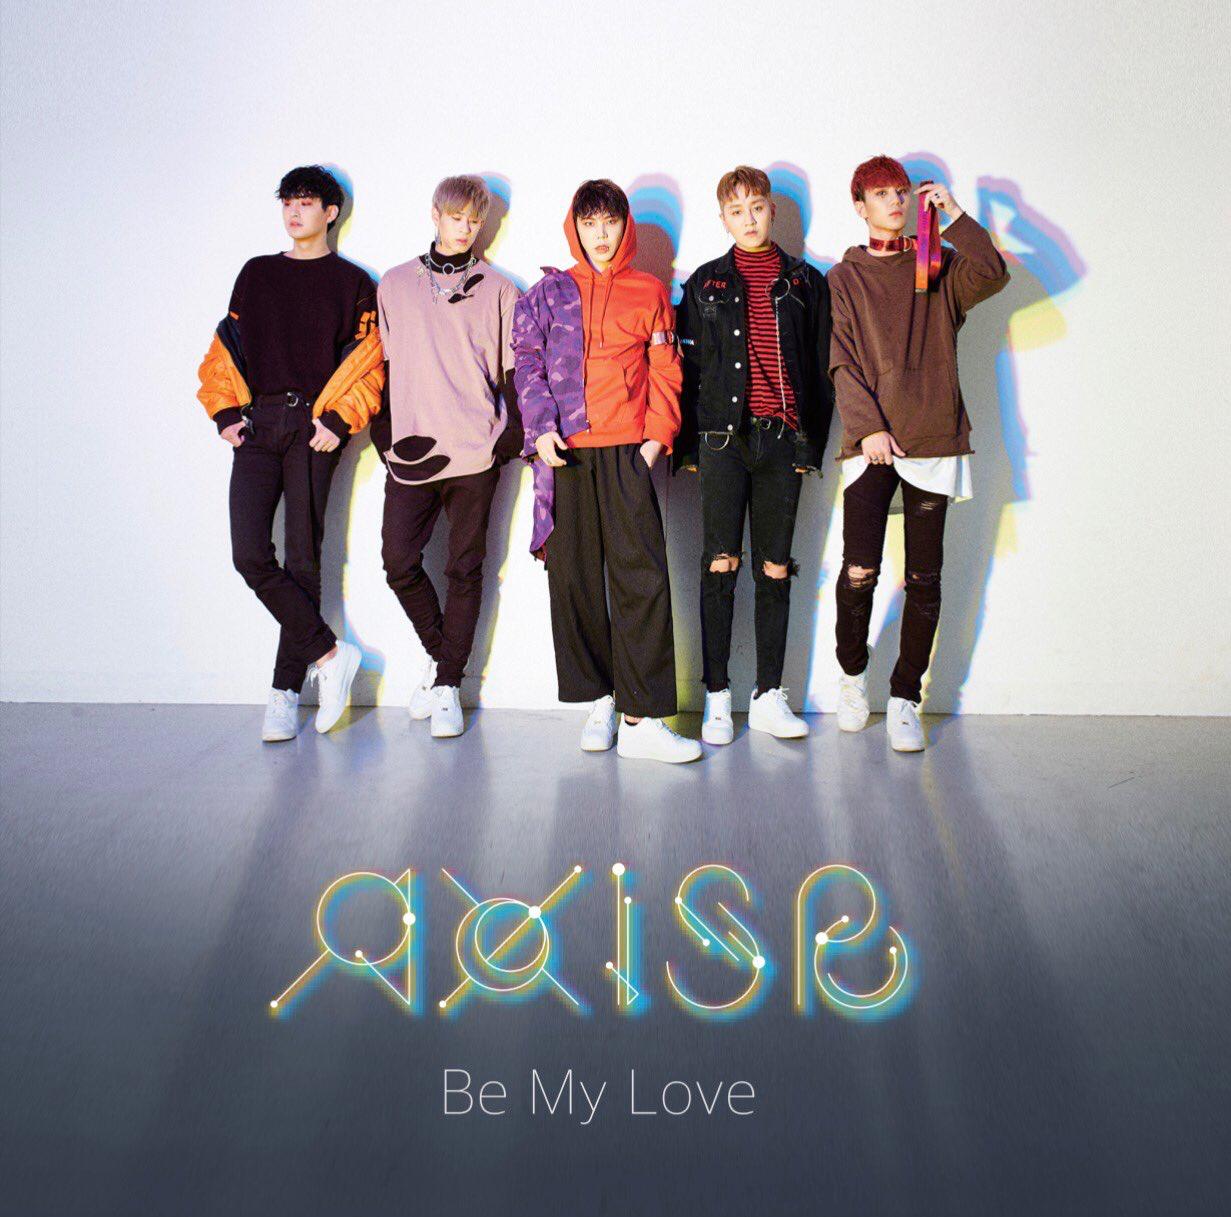 Be My Love (AxisB)